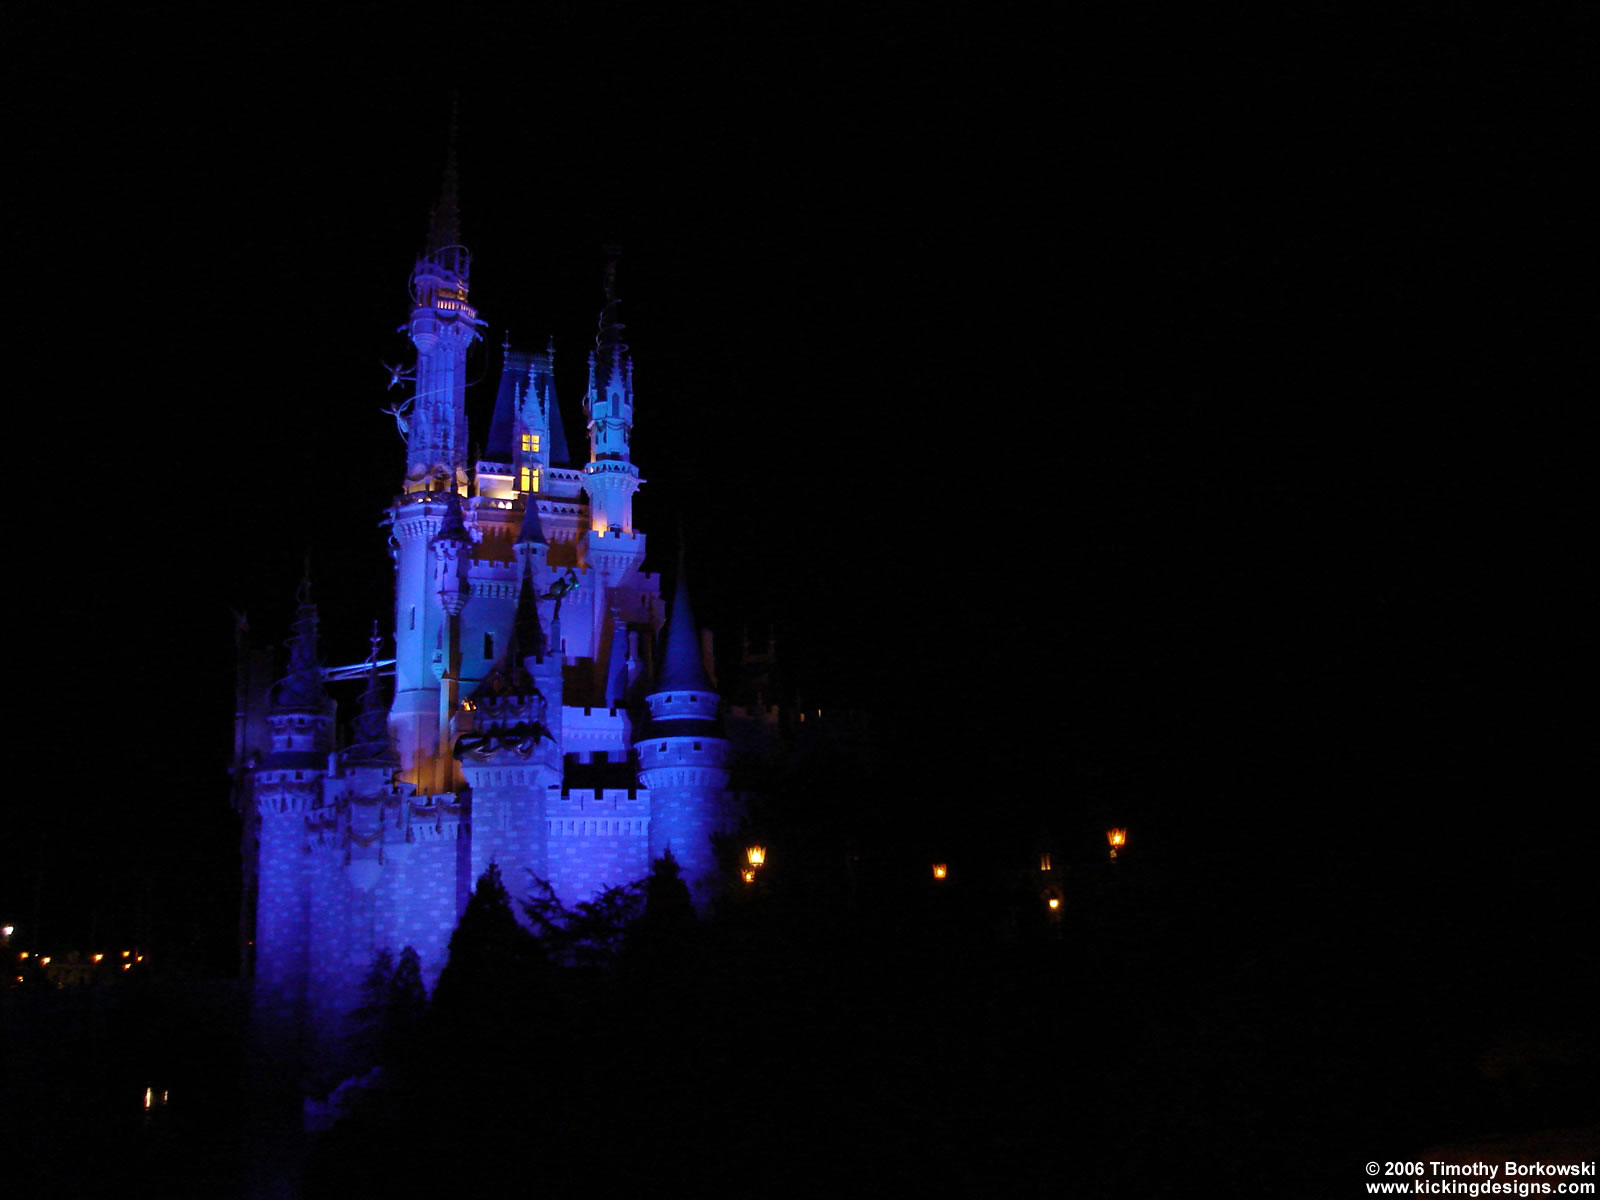 Disney World Magic Kingdom Desktop Wallpaper 1600 X 1200 Kicking Designs Kicking Designs